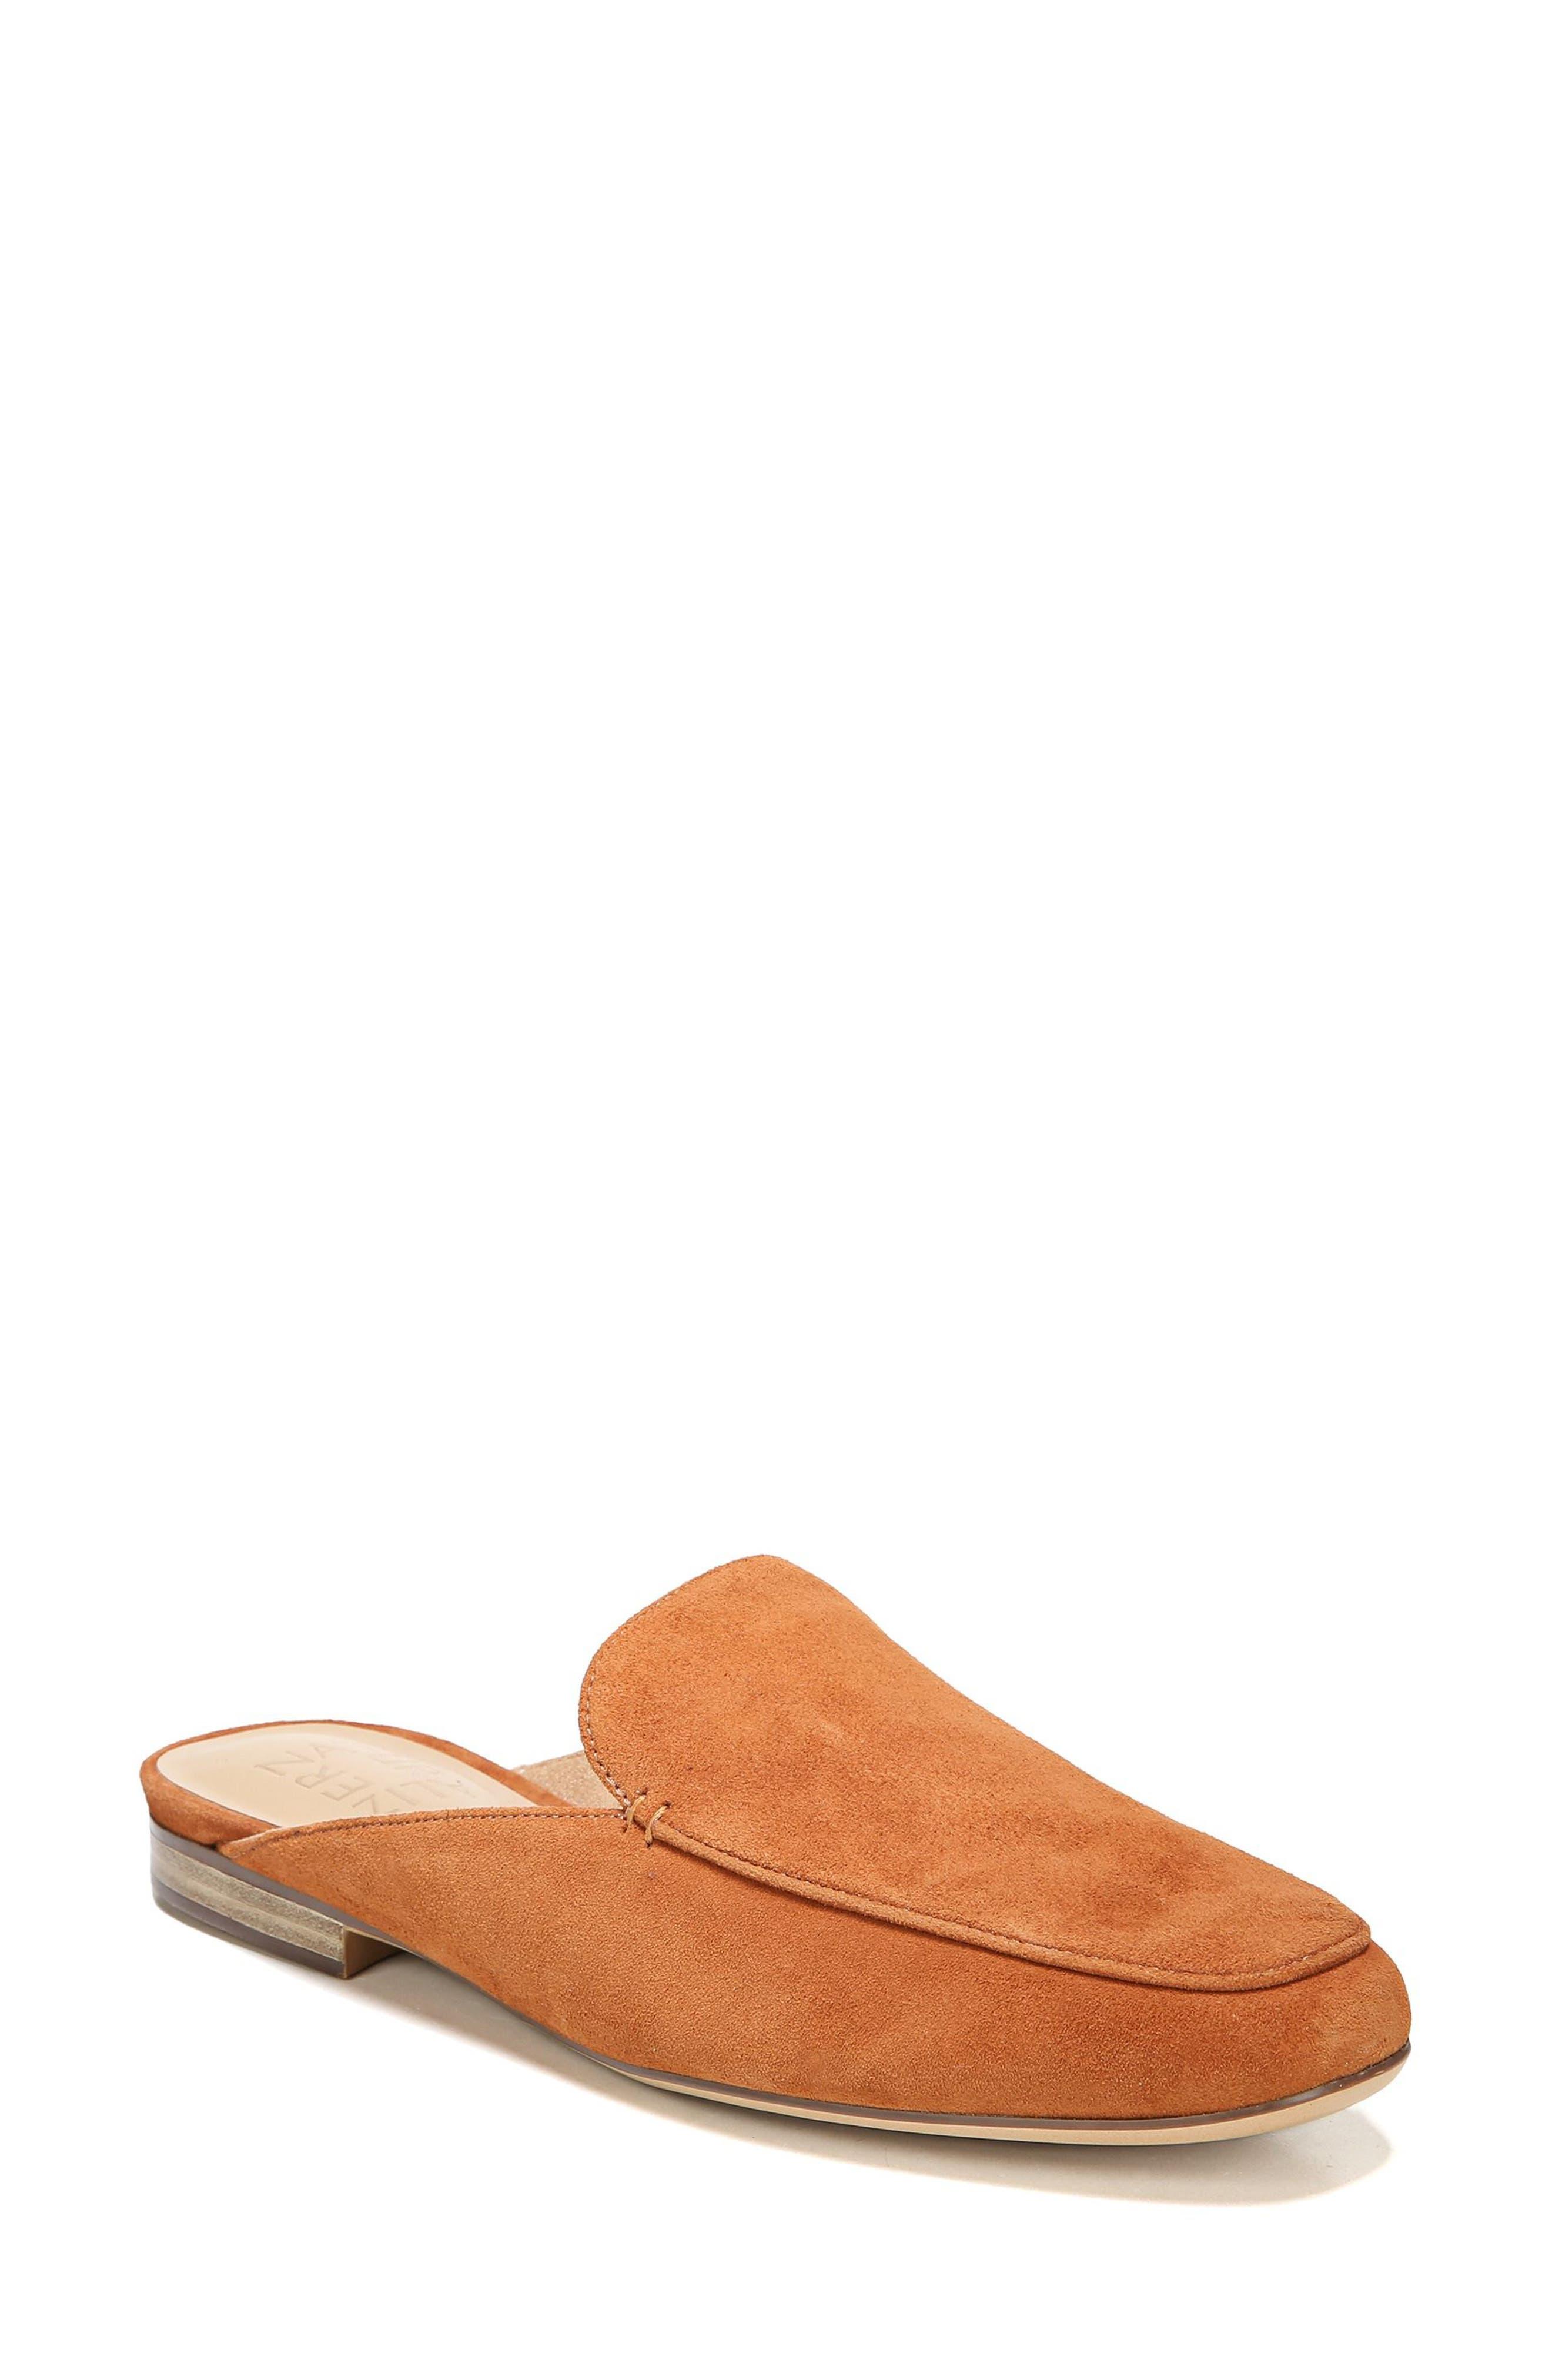 Eden Mule,                         Main,                         color, Light Maple Leather